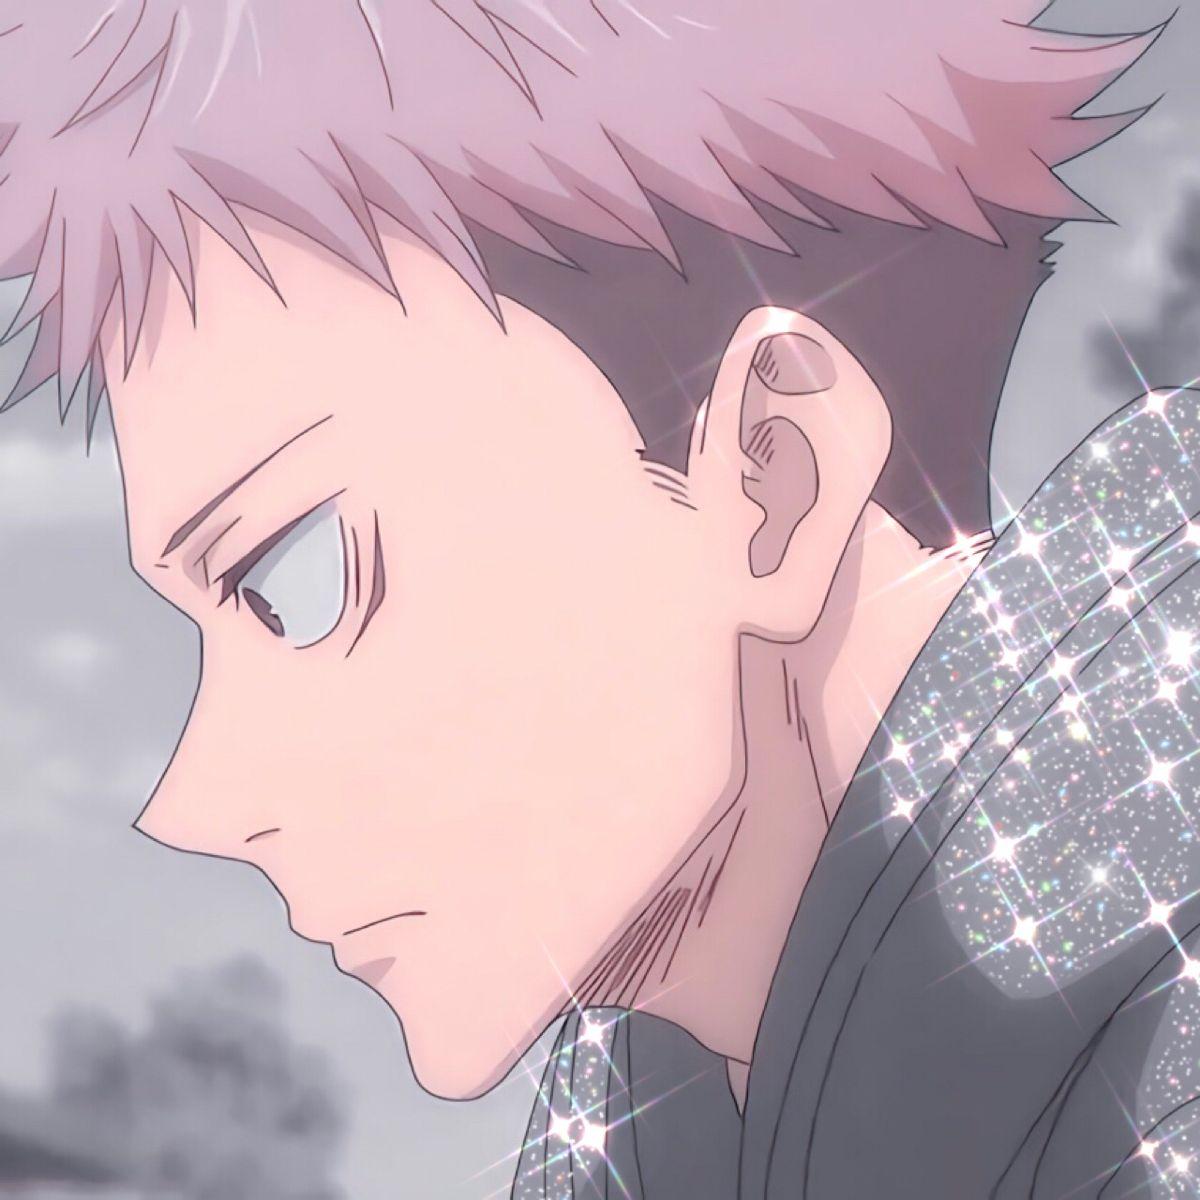 Jujutsu Kaisen Itadori Yuuji Glitter Icon Anime Drawings Boy Funny Anime Pics Anime